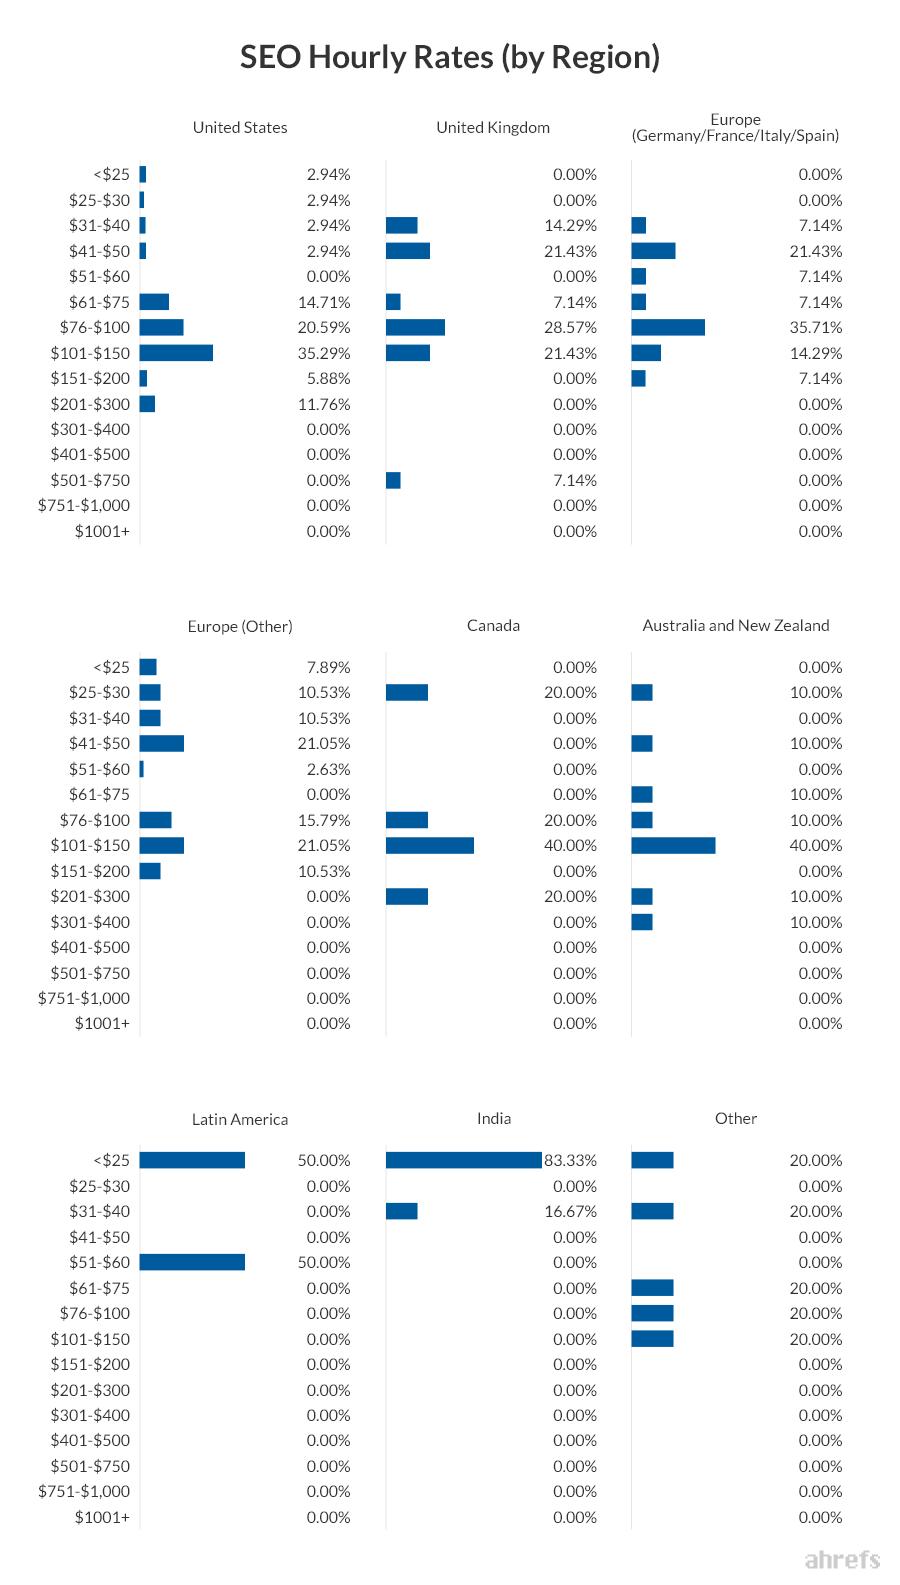 02 SEO Hourly Rates by Region